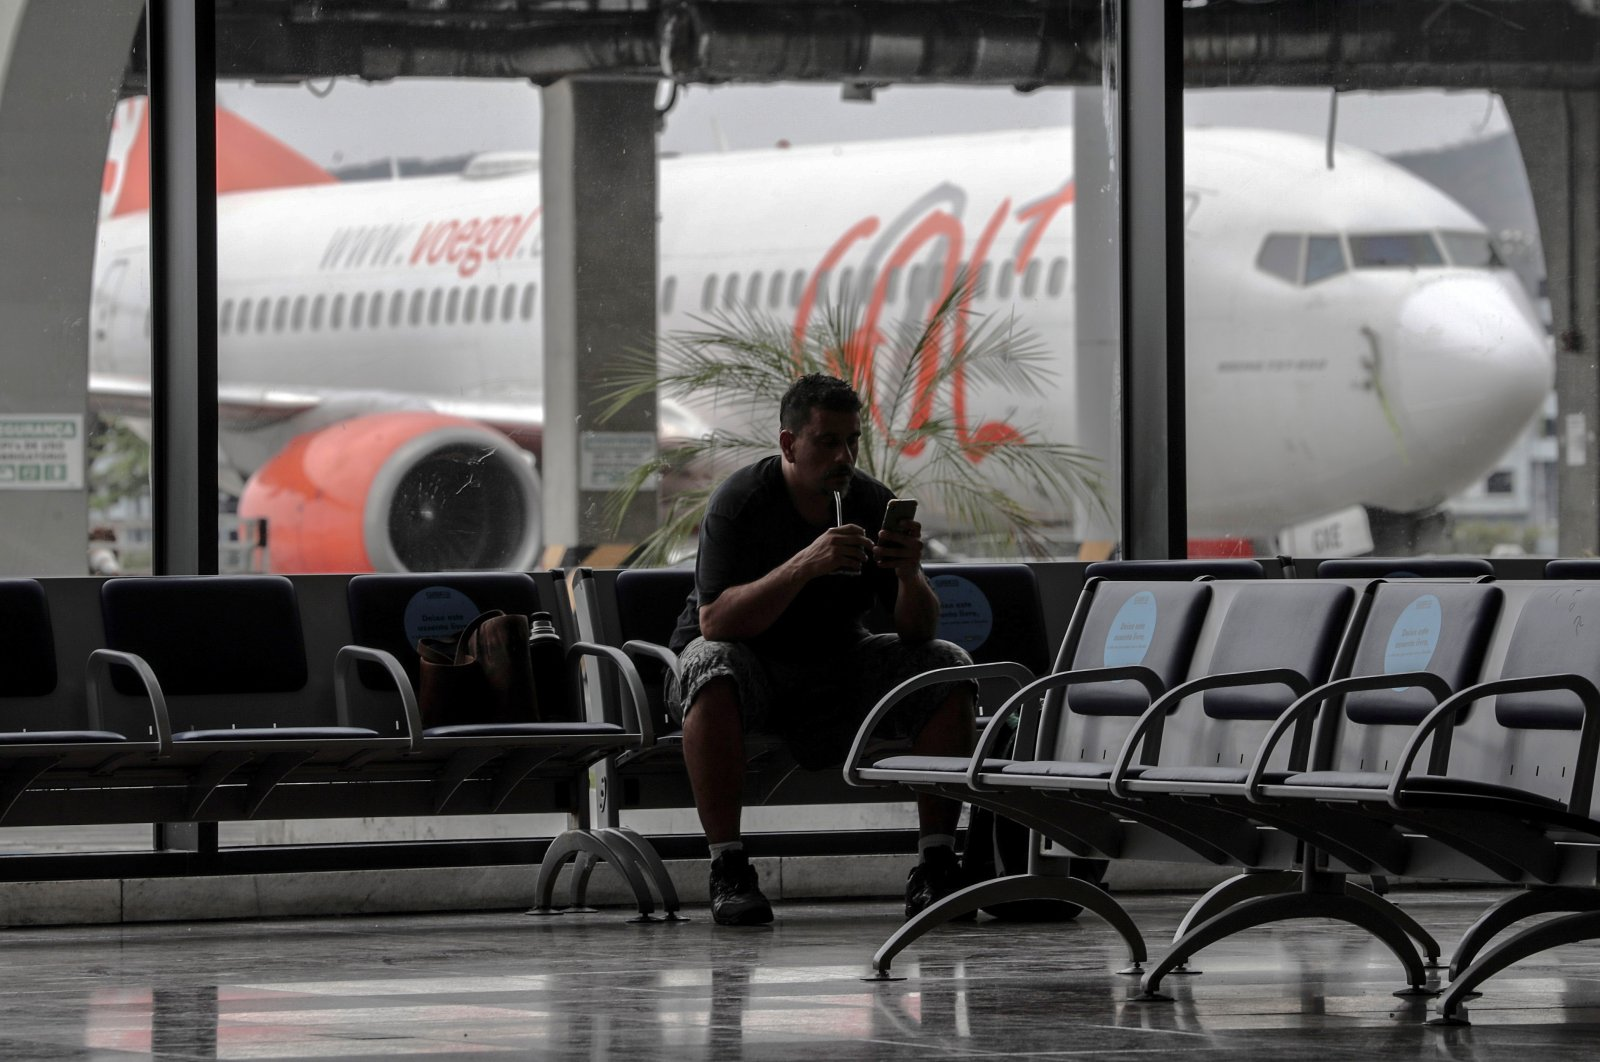 A man checks his phone in a waiting room at Santos Dumont airport, in Rio de Janeiro, Brazil, Aug. 20, 2020. (EPA Photo)